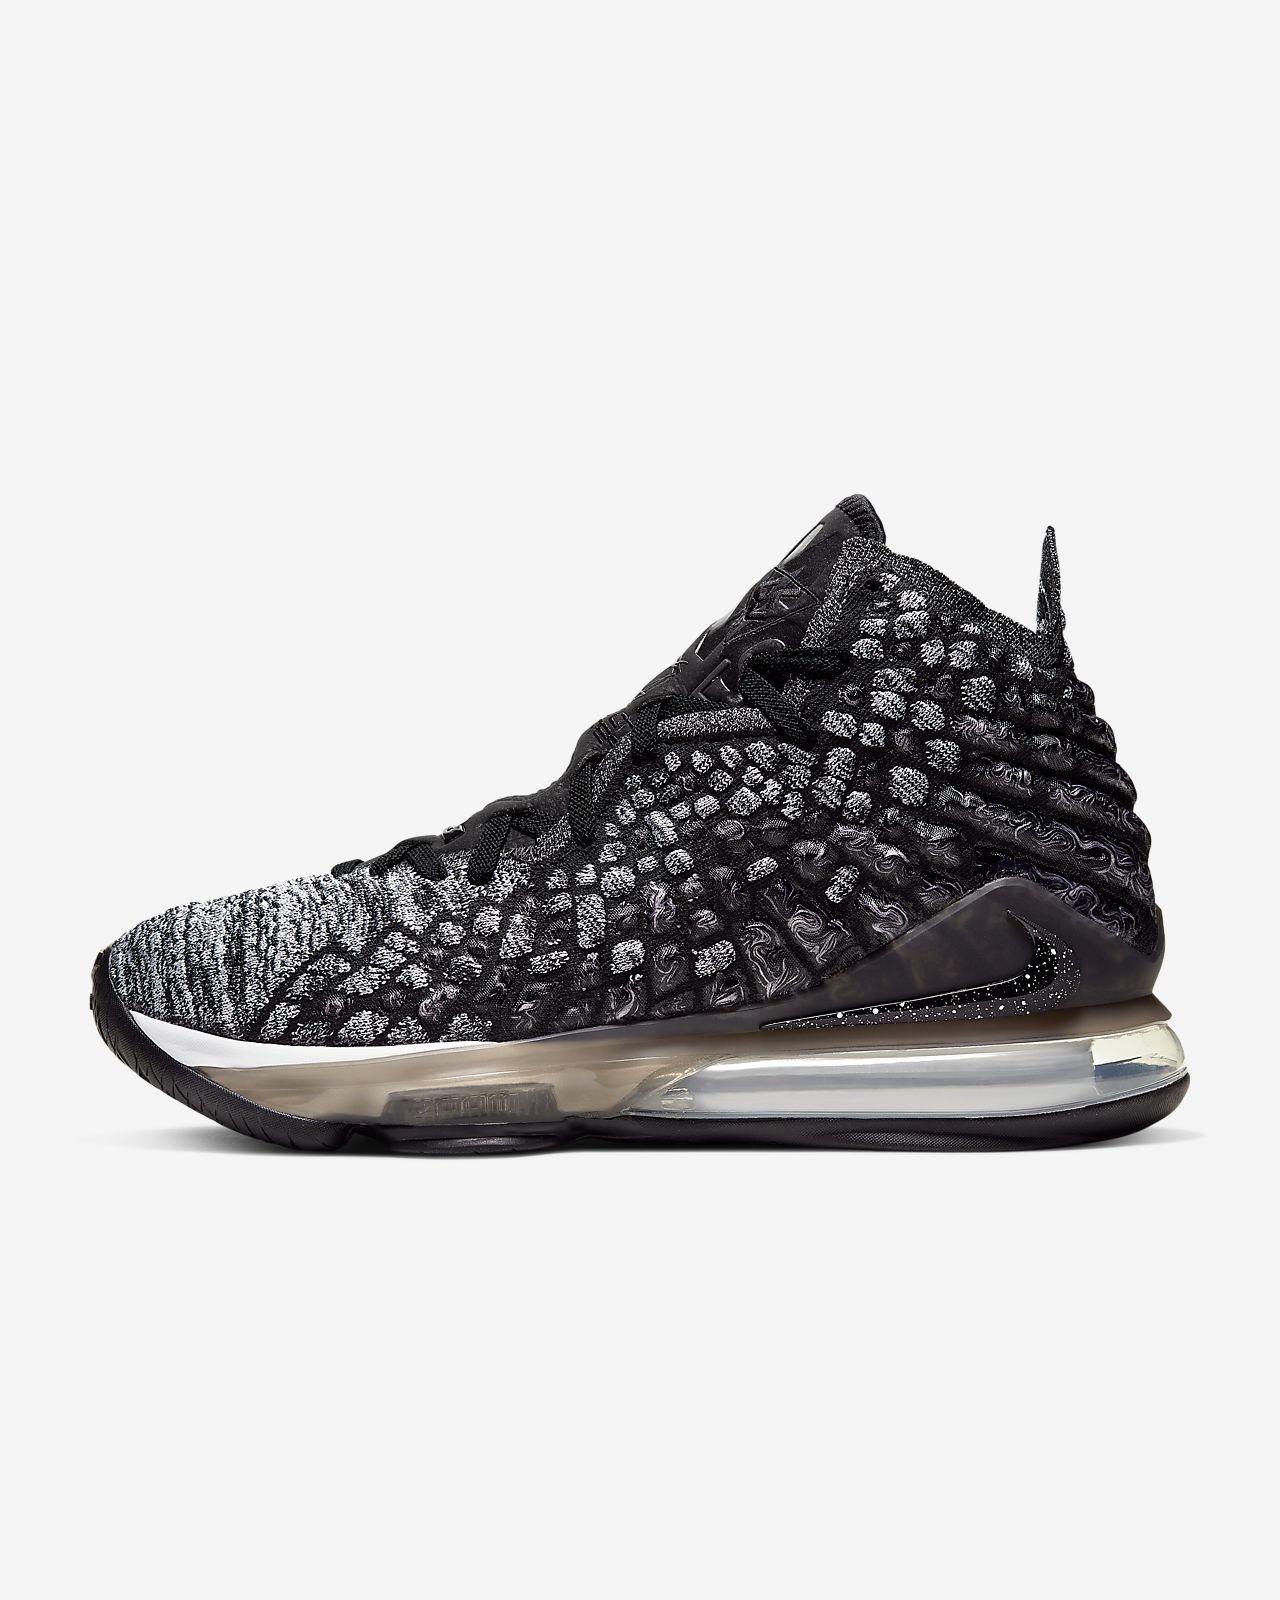 Lebron 15,Lebrons Shoes,Nike KD X Shoes white